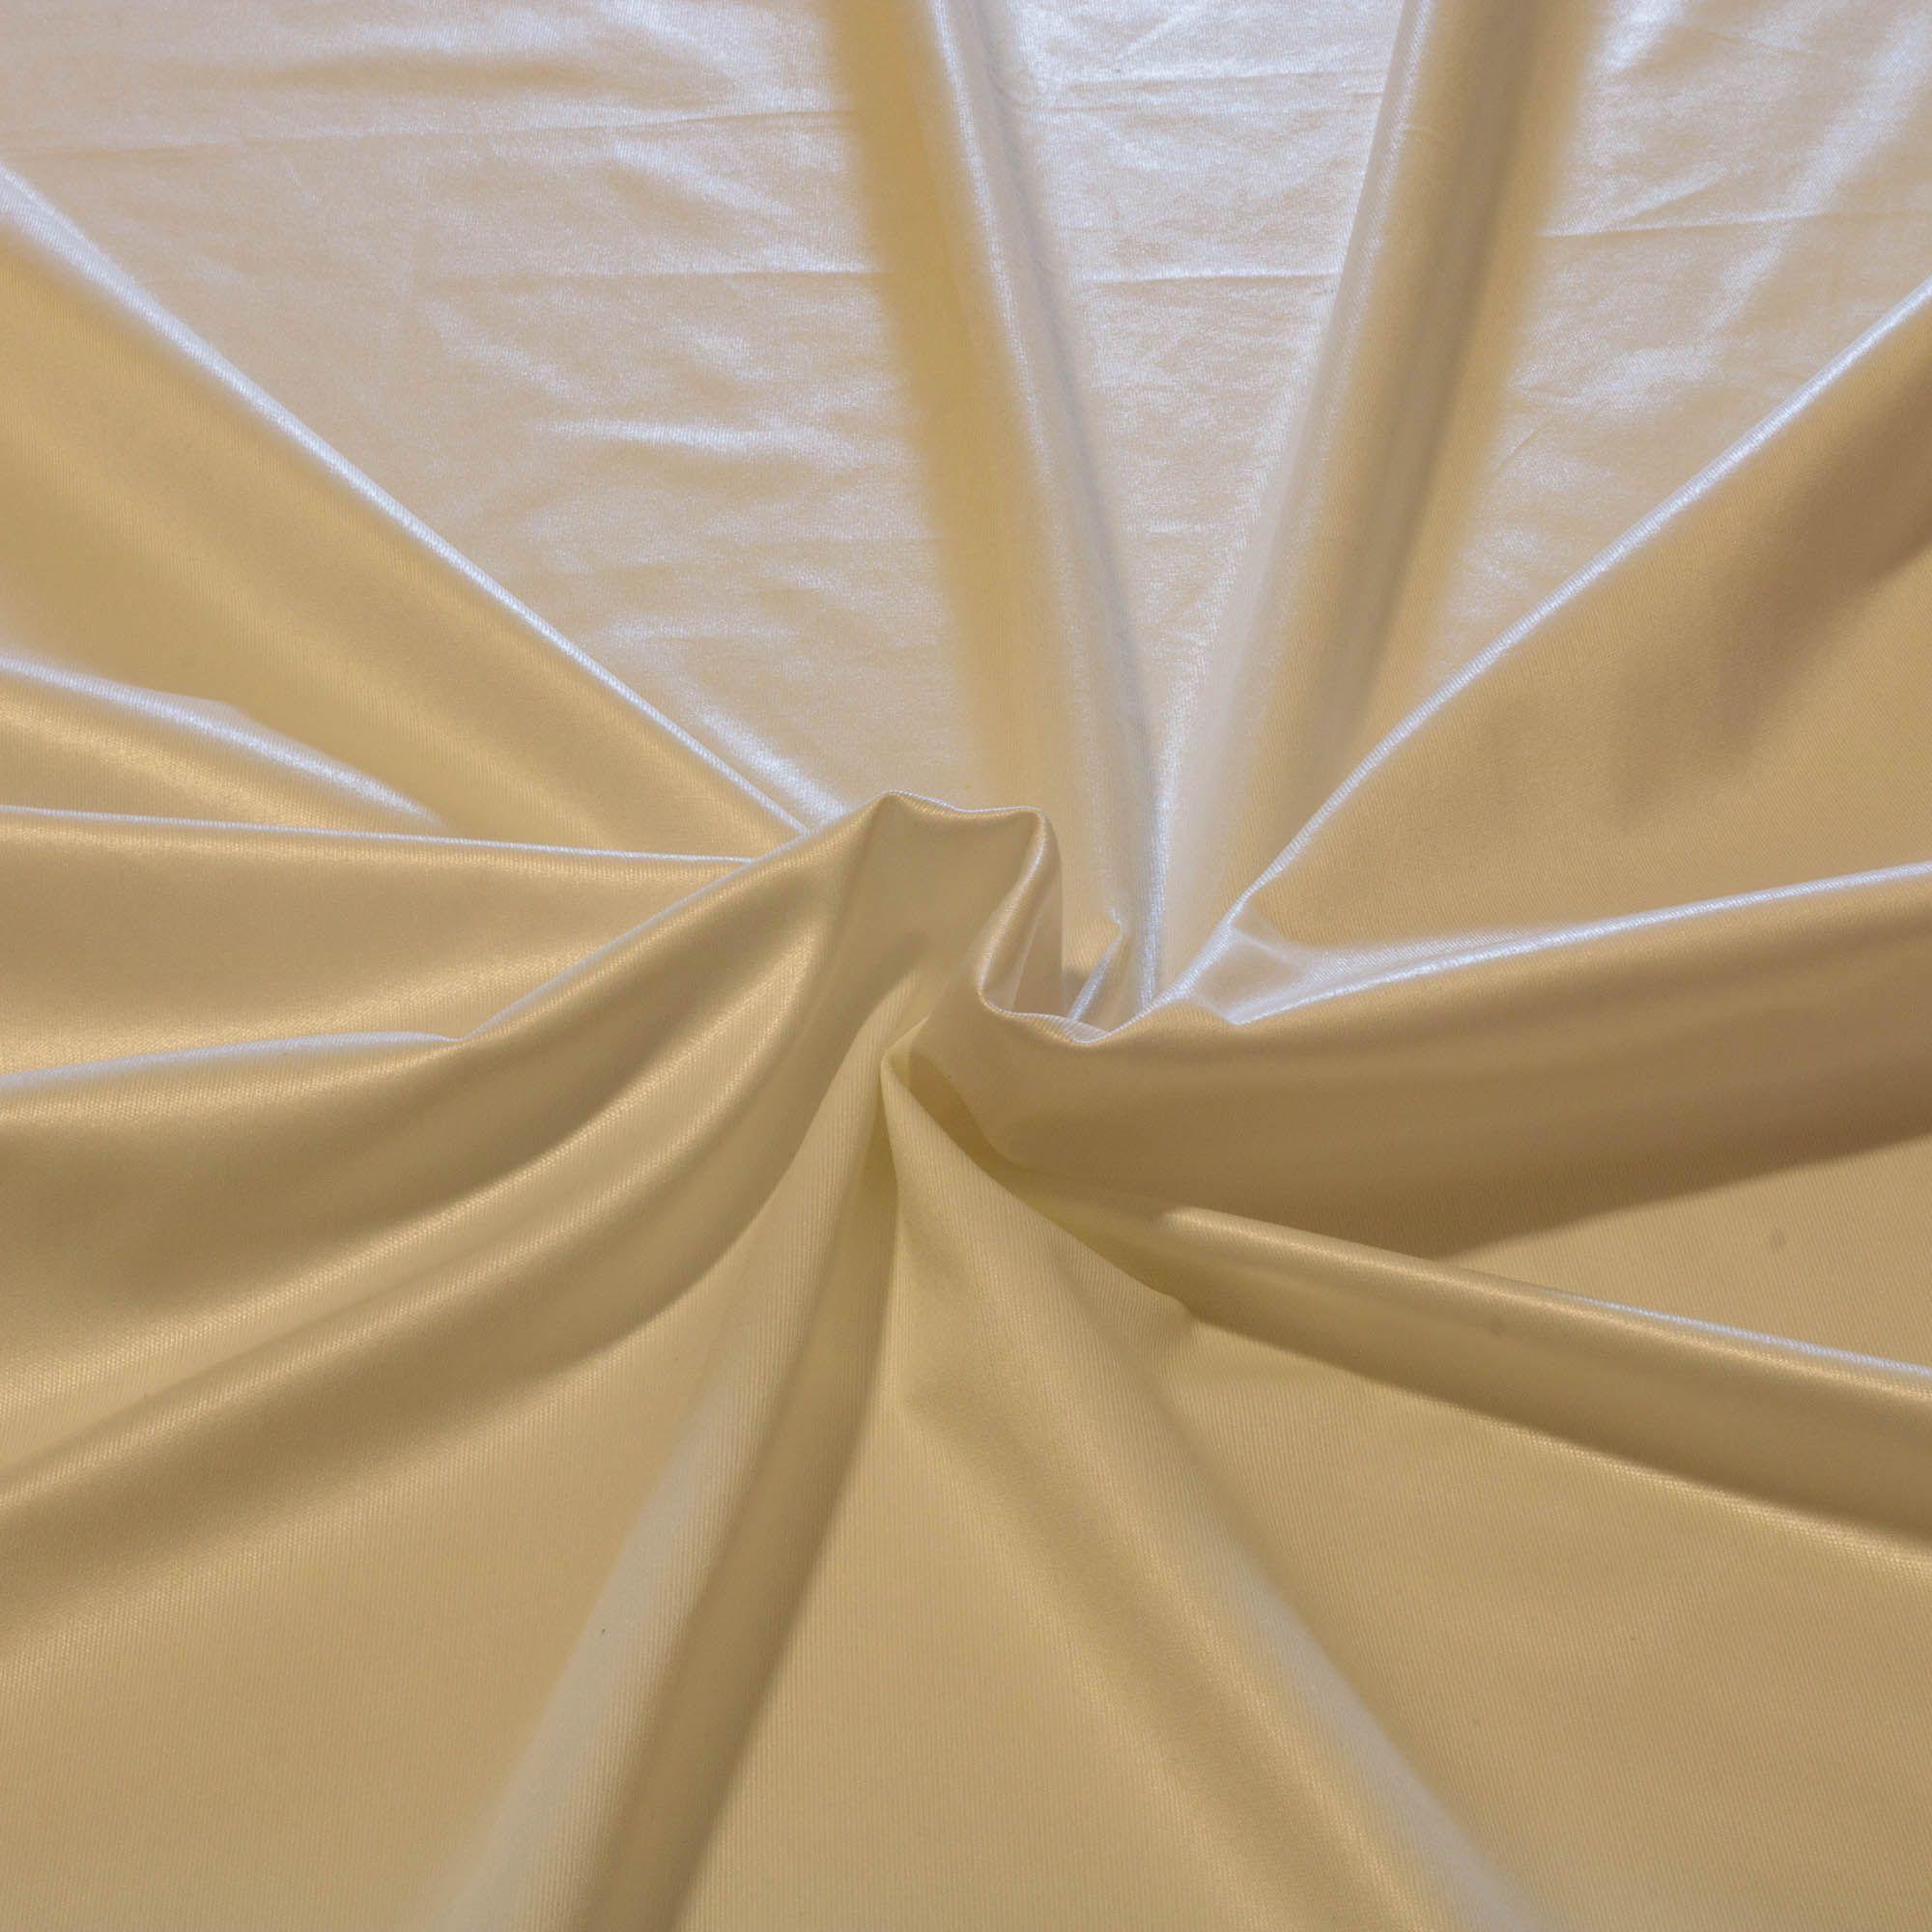 Tecido Malha Cirrê Branca 84% Poliamida 16% Elastano 1,50 m Largura